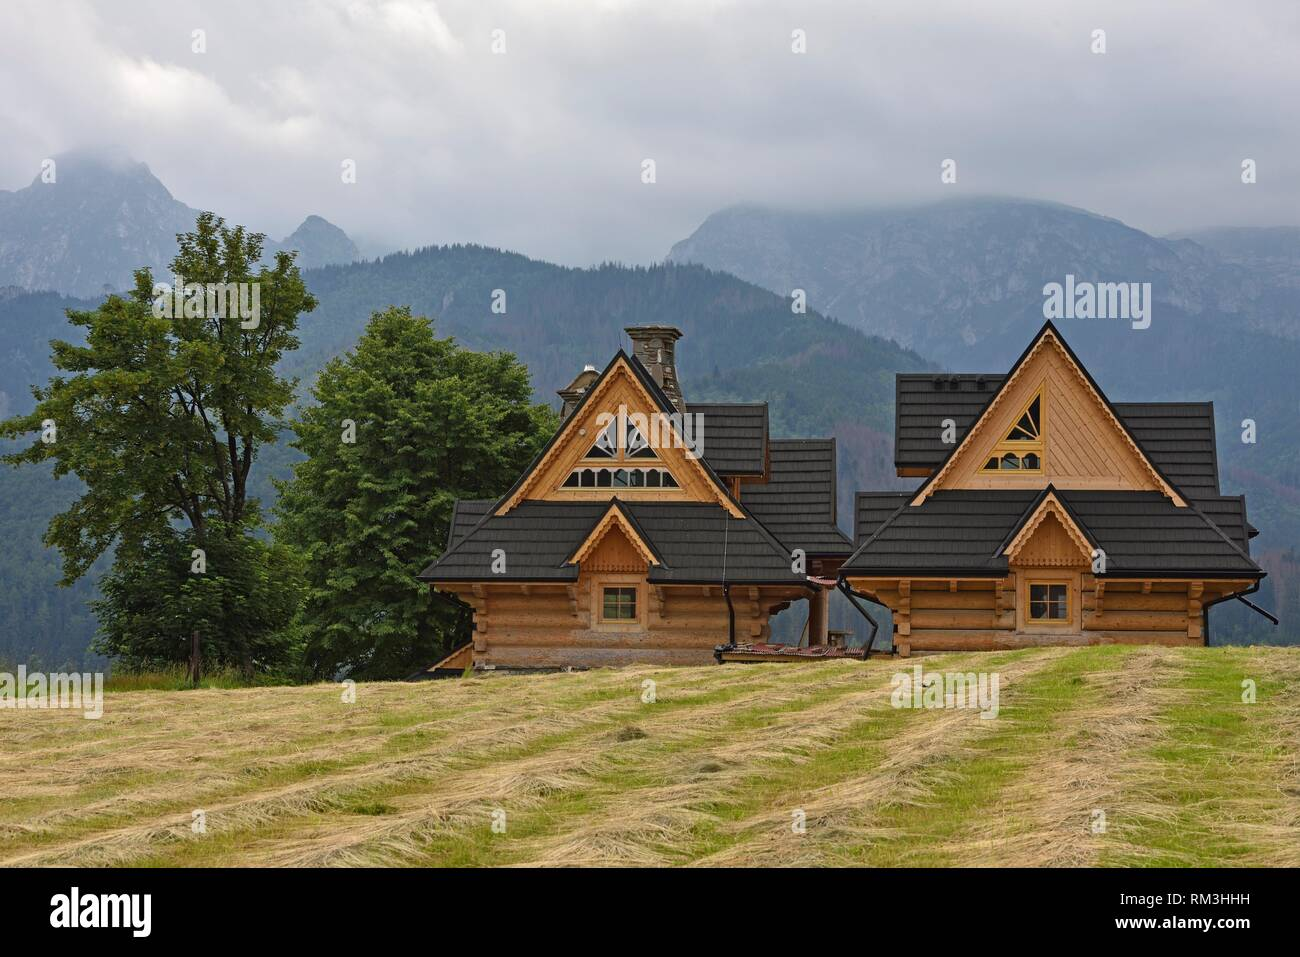 Maison Moderne En Bois A Lu0027architecture Inspiree Du Style Zakopane Avec La  Chaine Des Tatras En Arriere Plan, Zakopane, Region Podhale, Massif Des